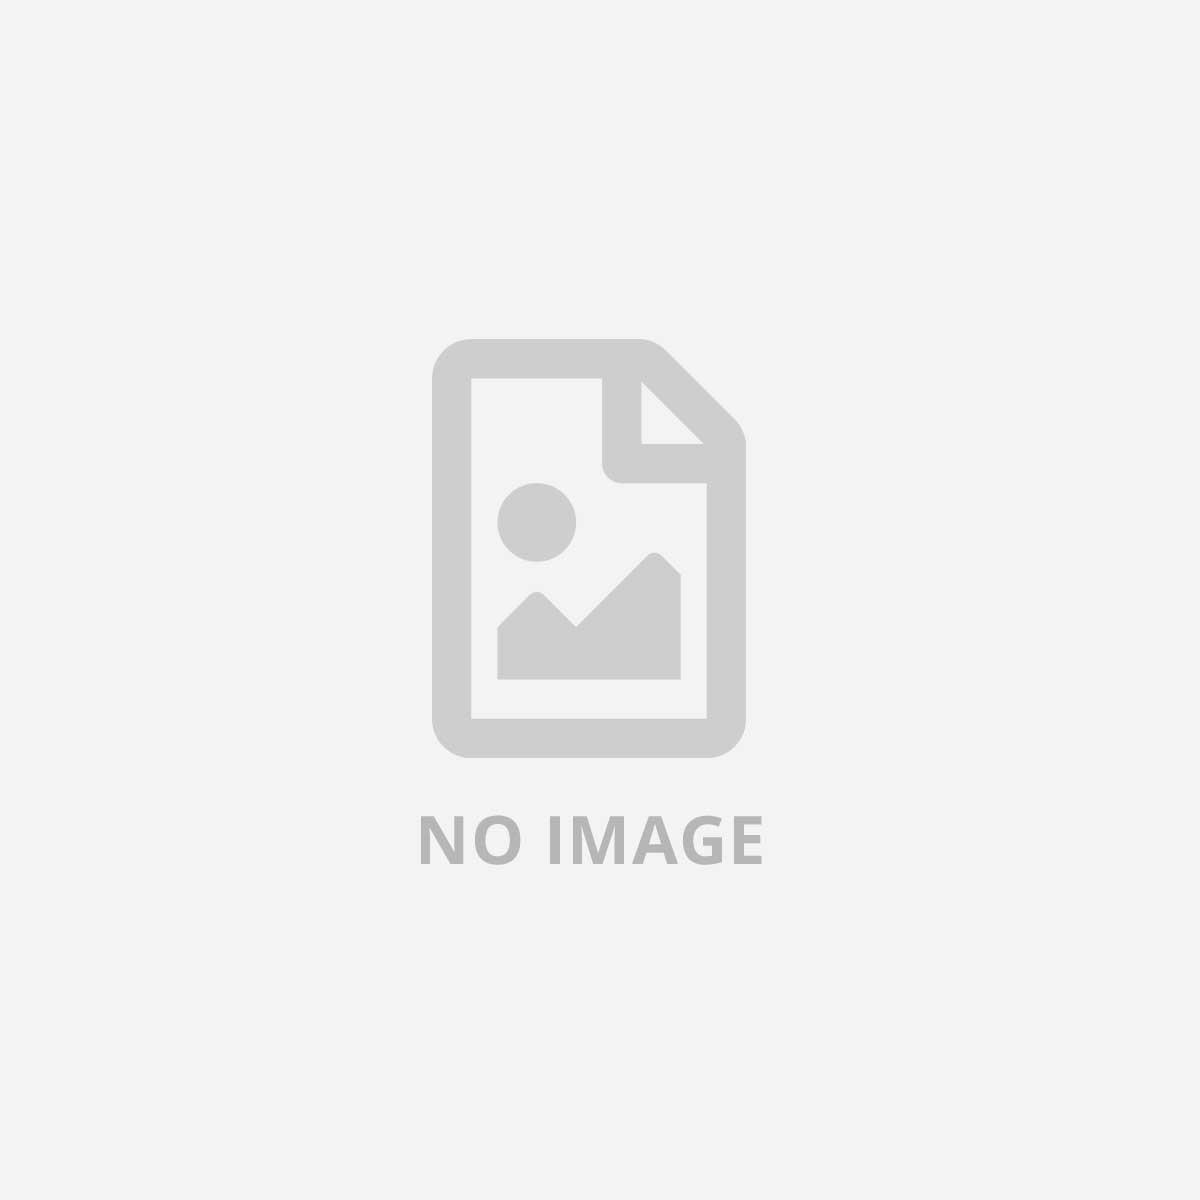 CANON EOS M50 BLACK + EF-M 15-45 MM